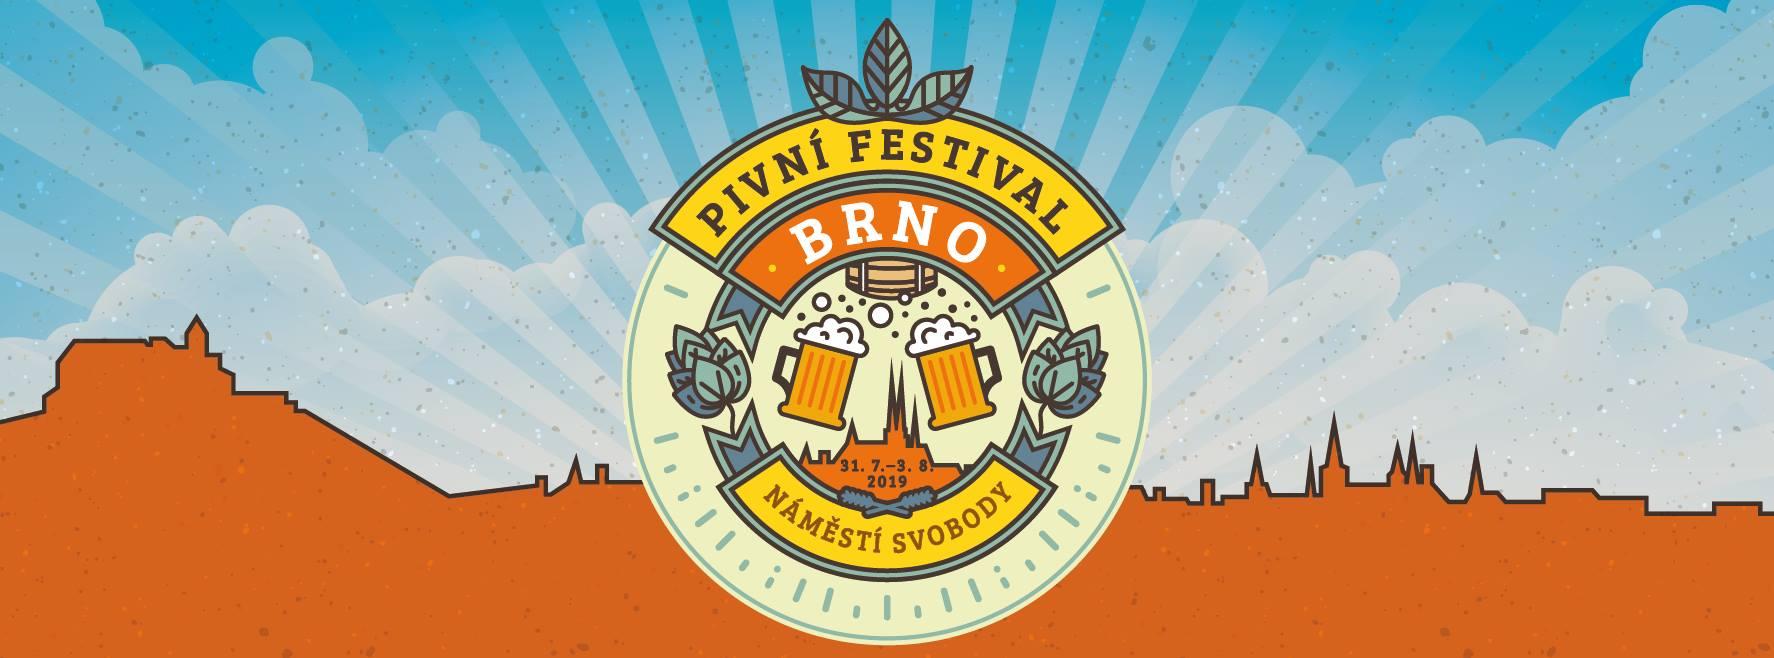 pivni Festival-Brno